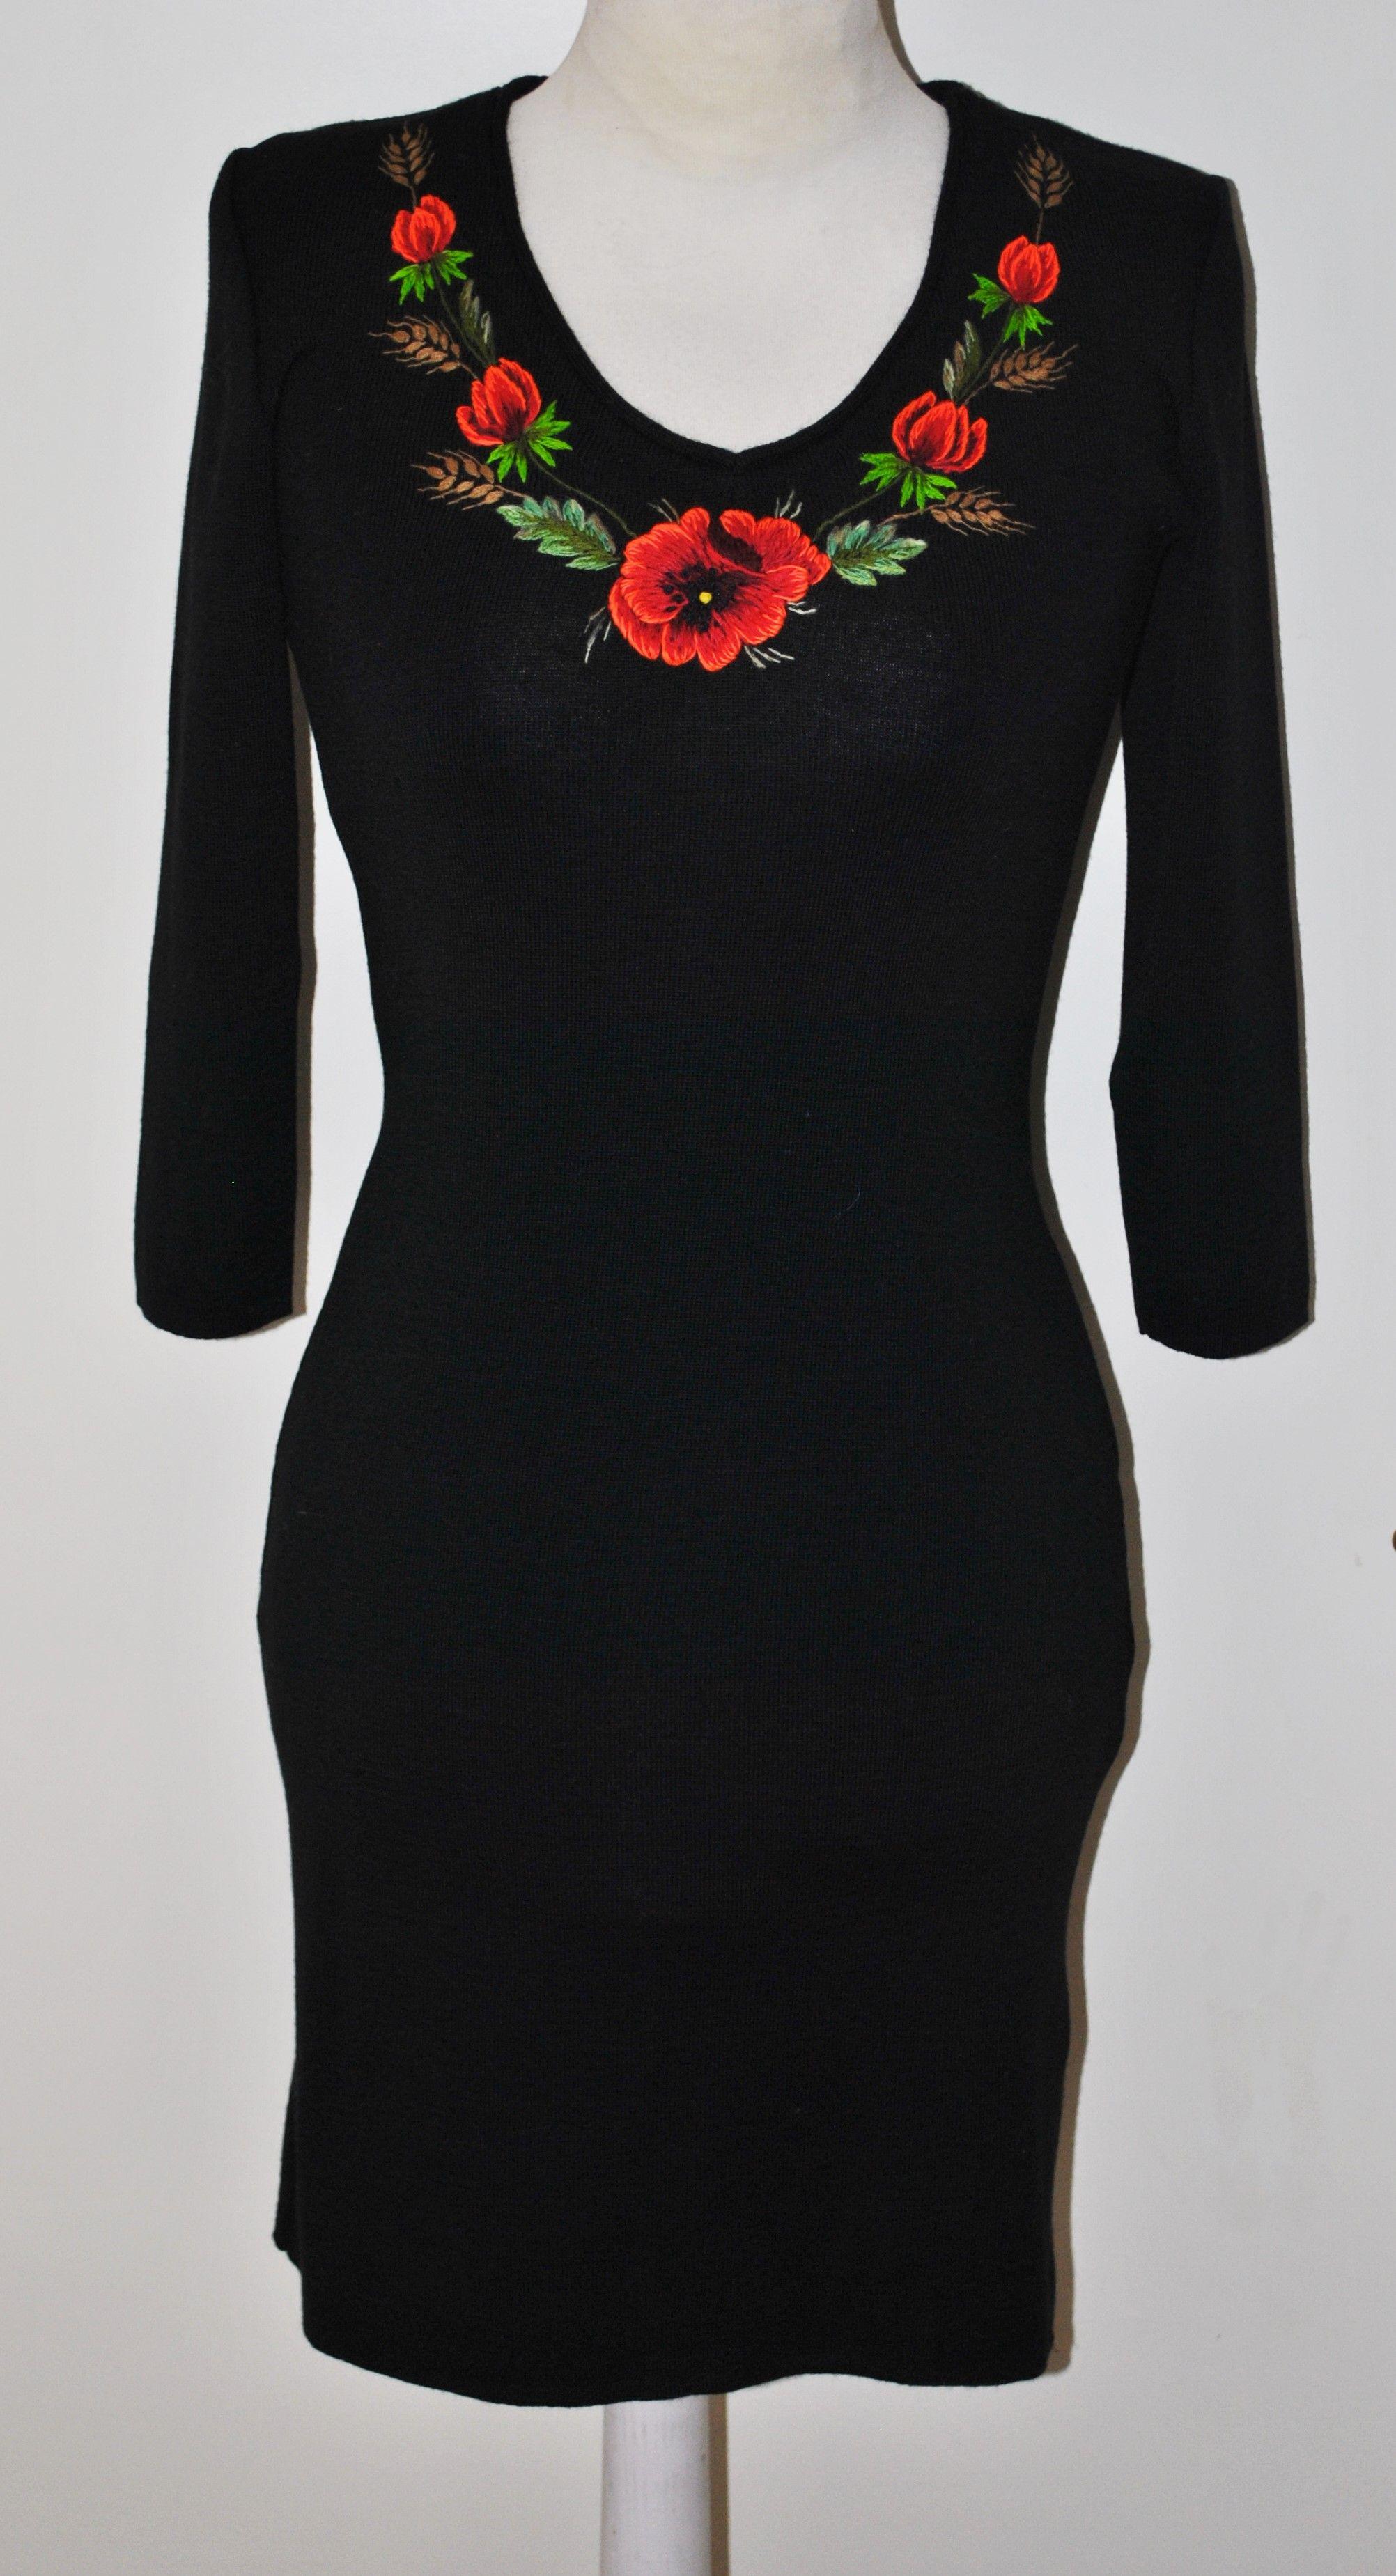 9abf6e8d9c1 Kleit nr 79 | muhu tikand | Sleeves, Tops, Long sleeve